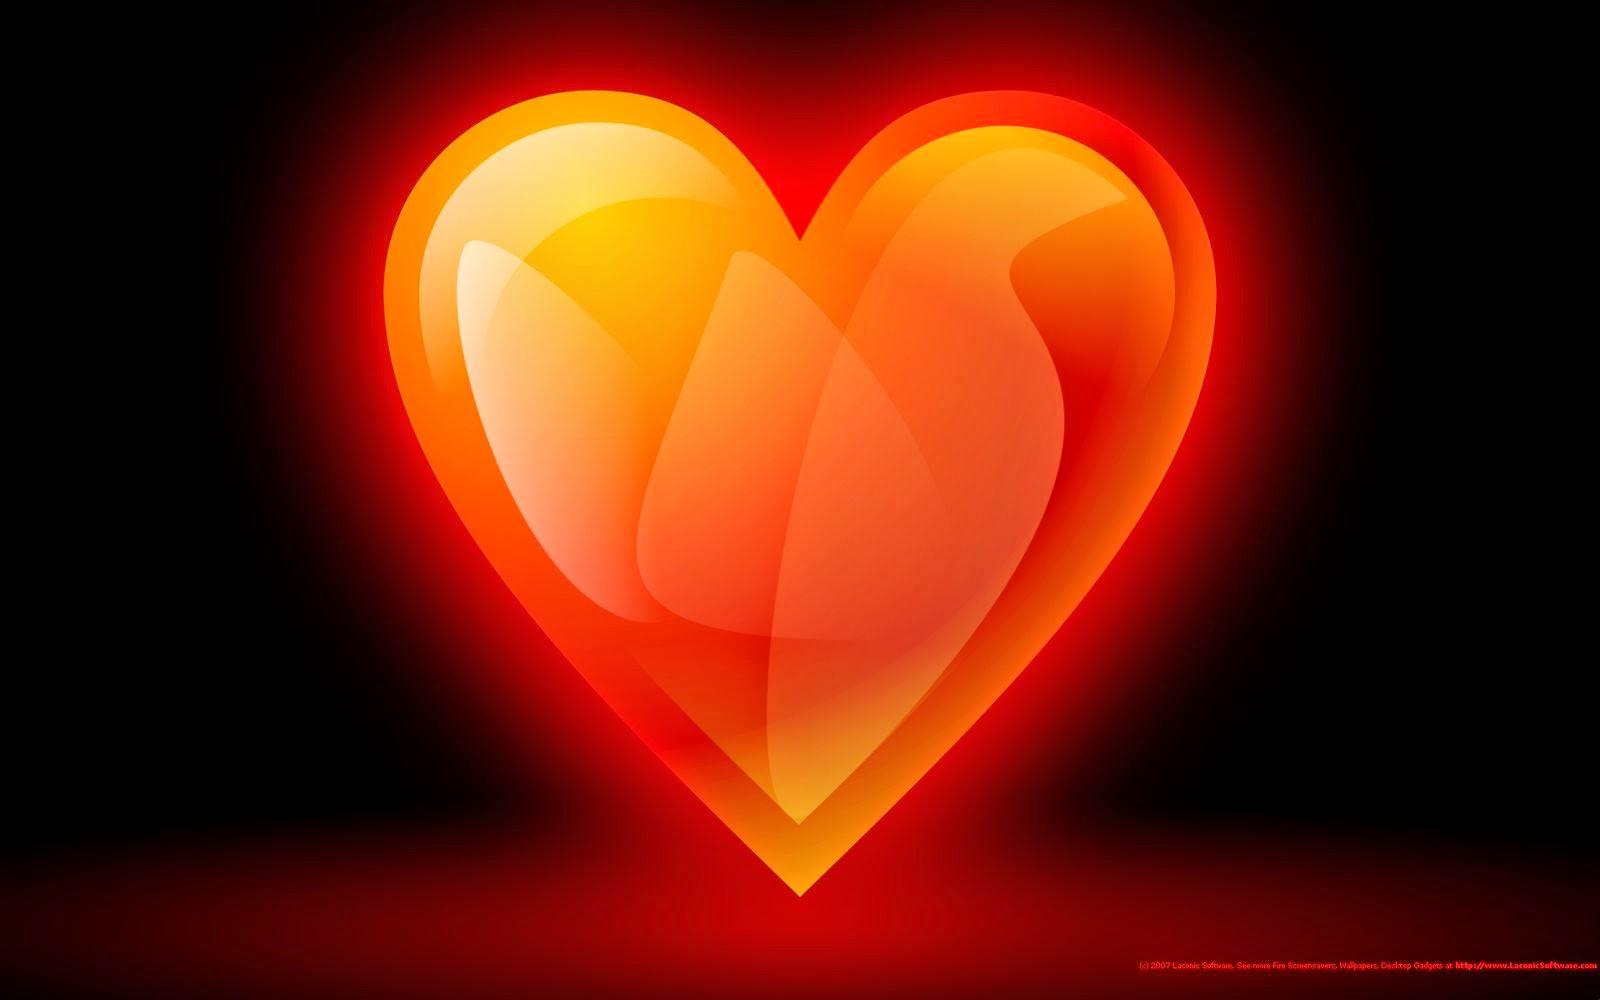 heart-of-flame-wallpaper-1920x1200